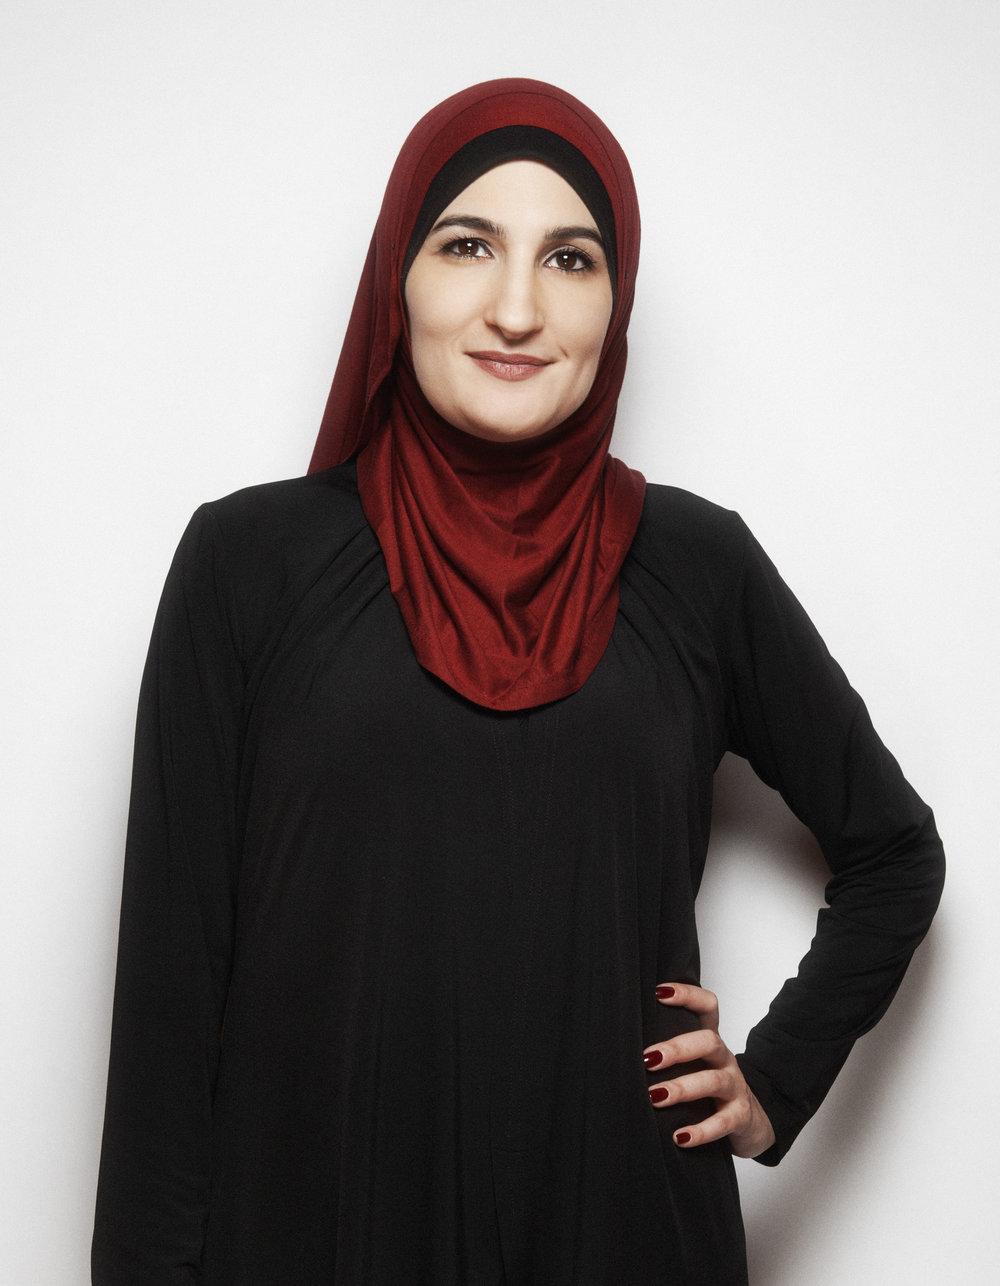 Copy of Linda Sarsour